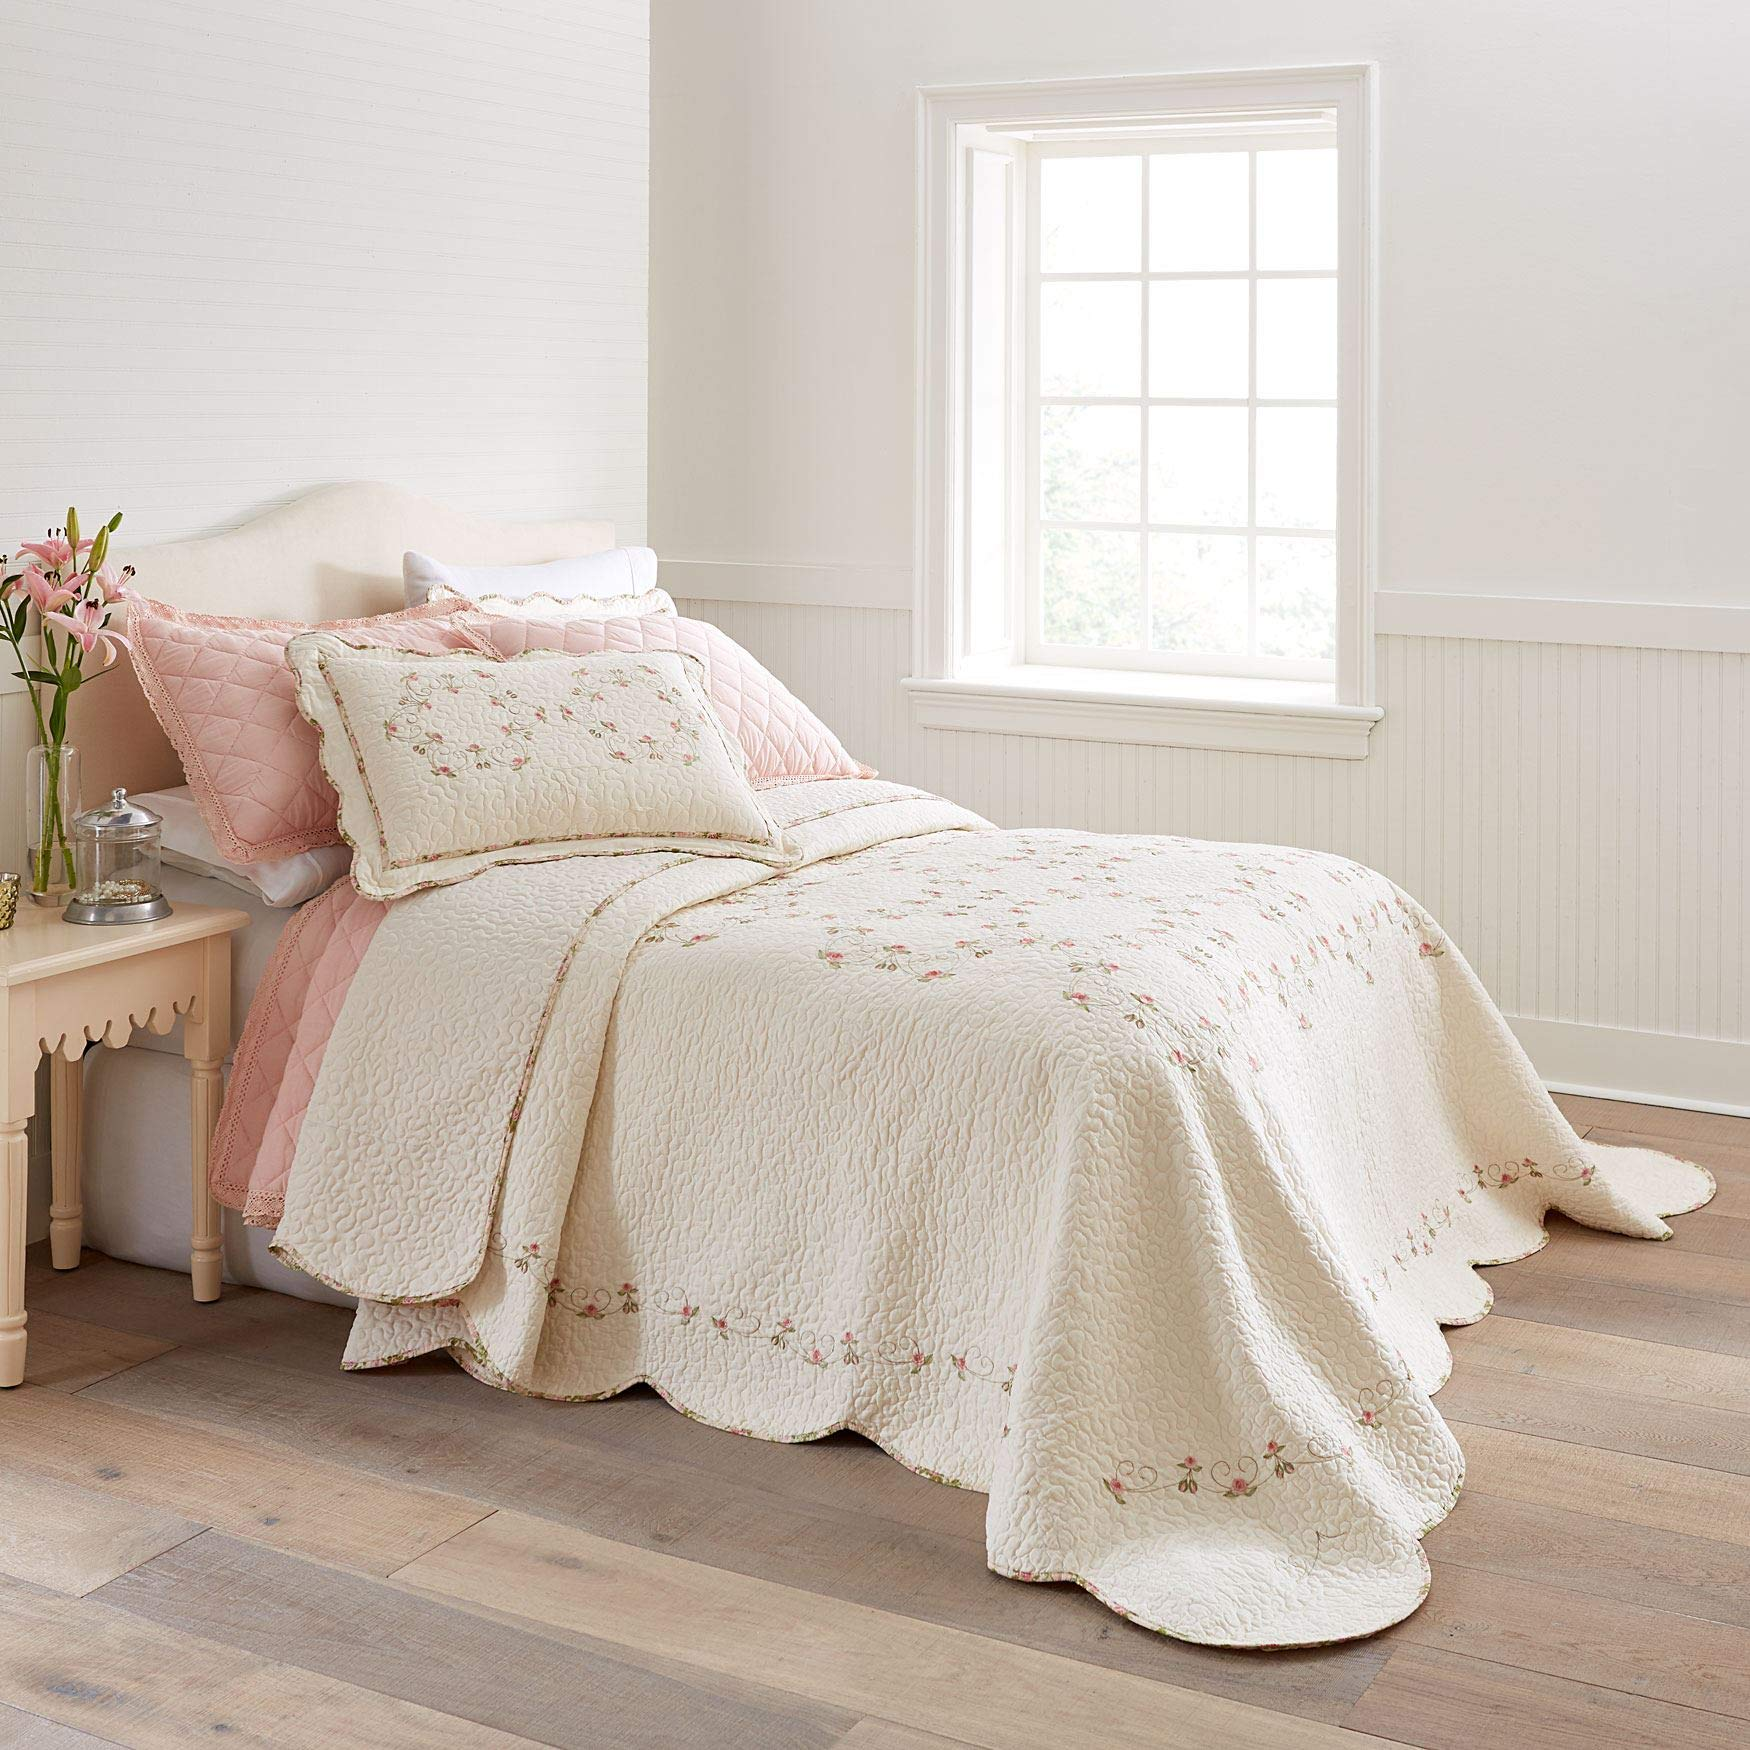 BrylaneHome Felisa Embroidered Bedspread - Ivory, Queen